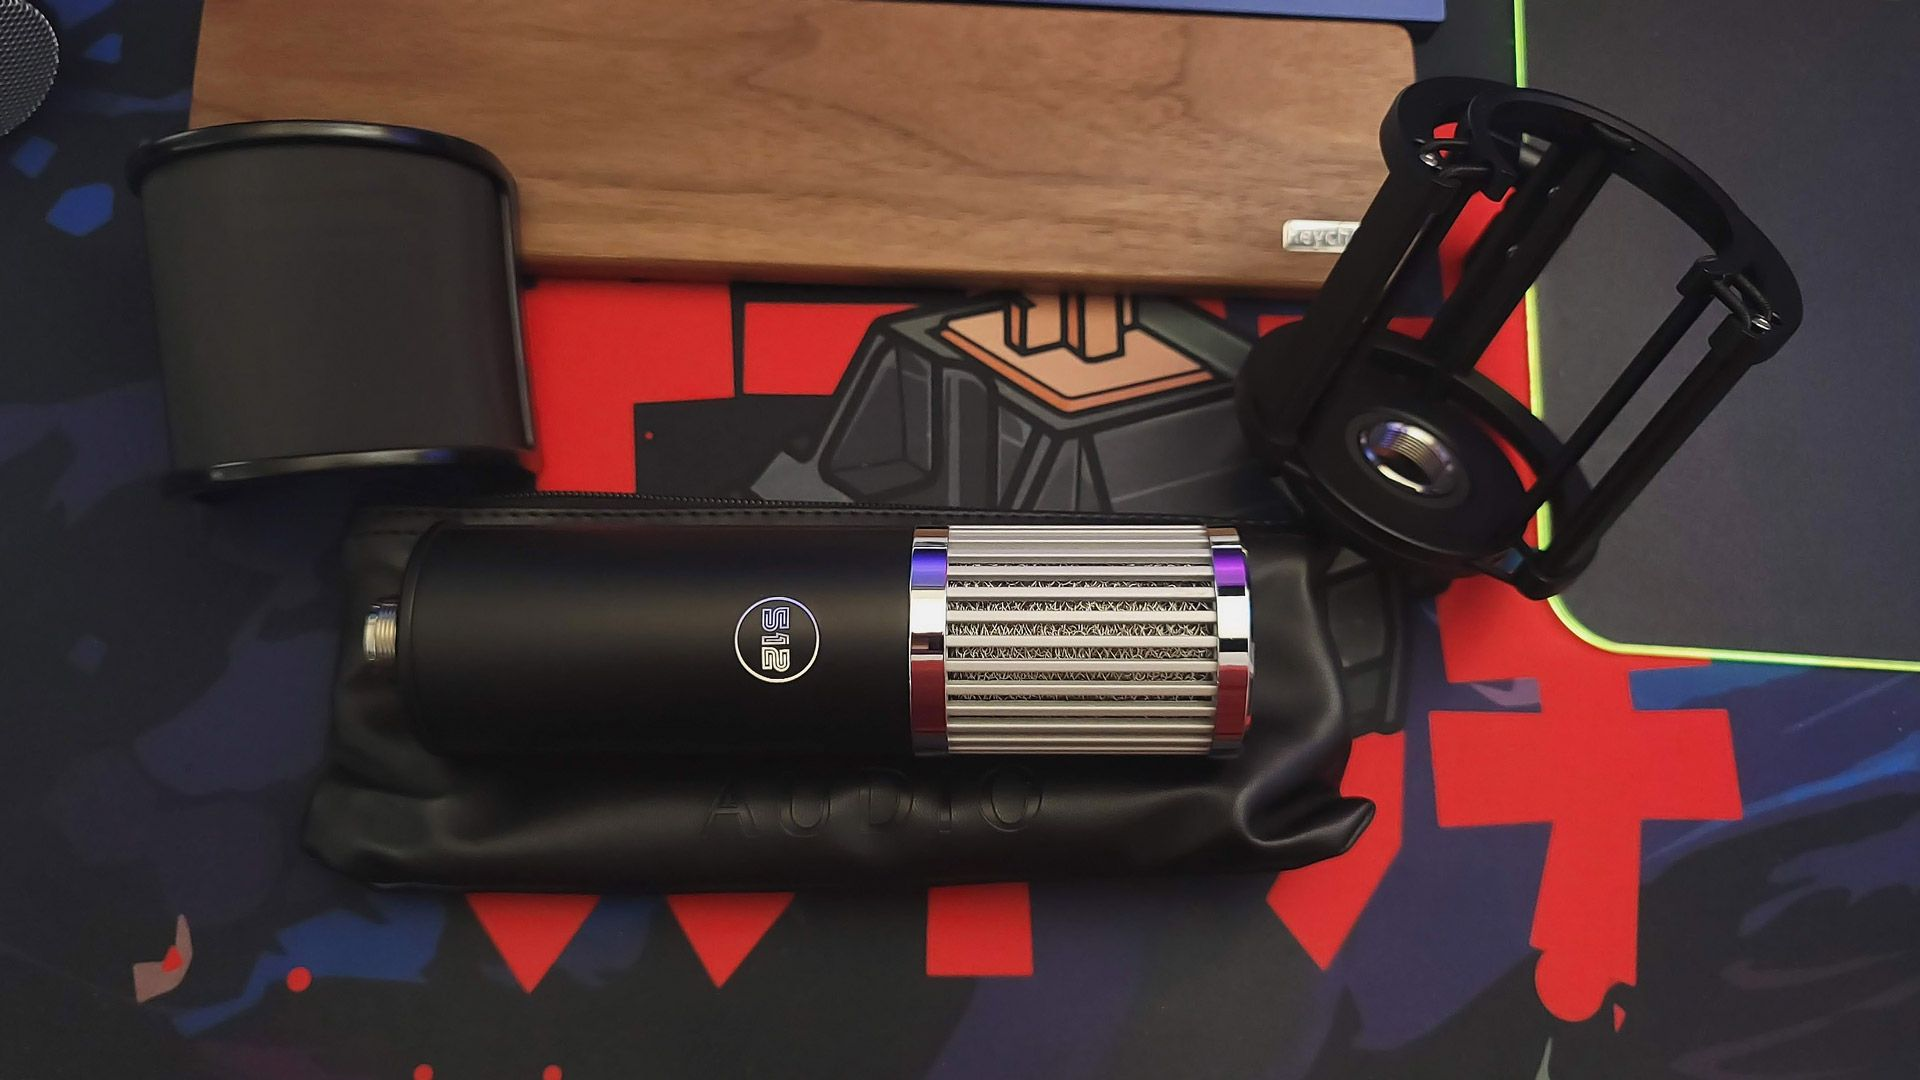 512-audio-skylight-studio-condenser-microphone-/-accesories-review-(pt.-2)